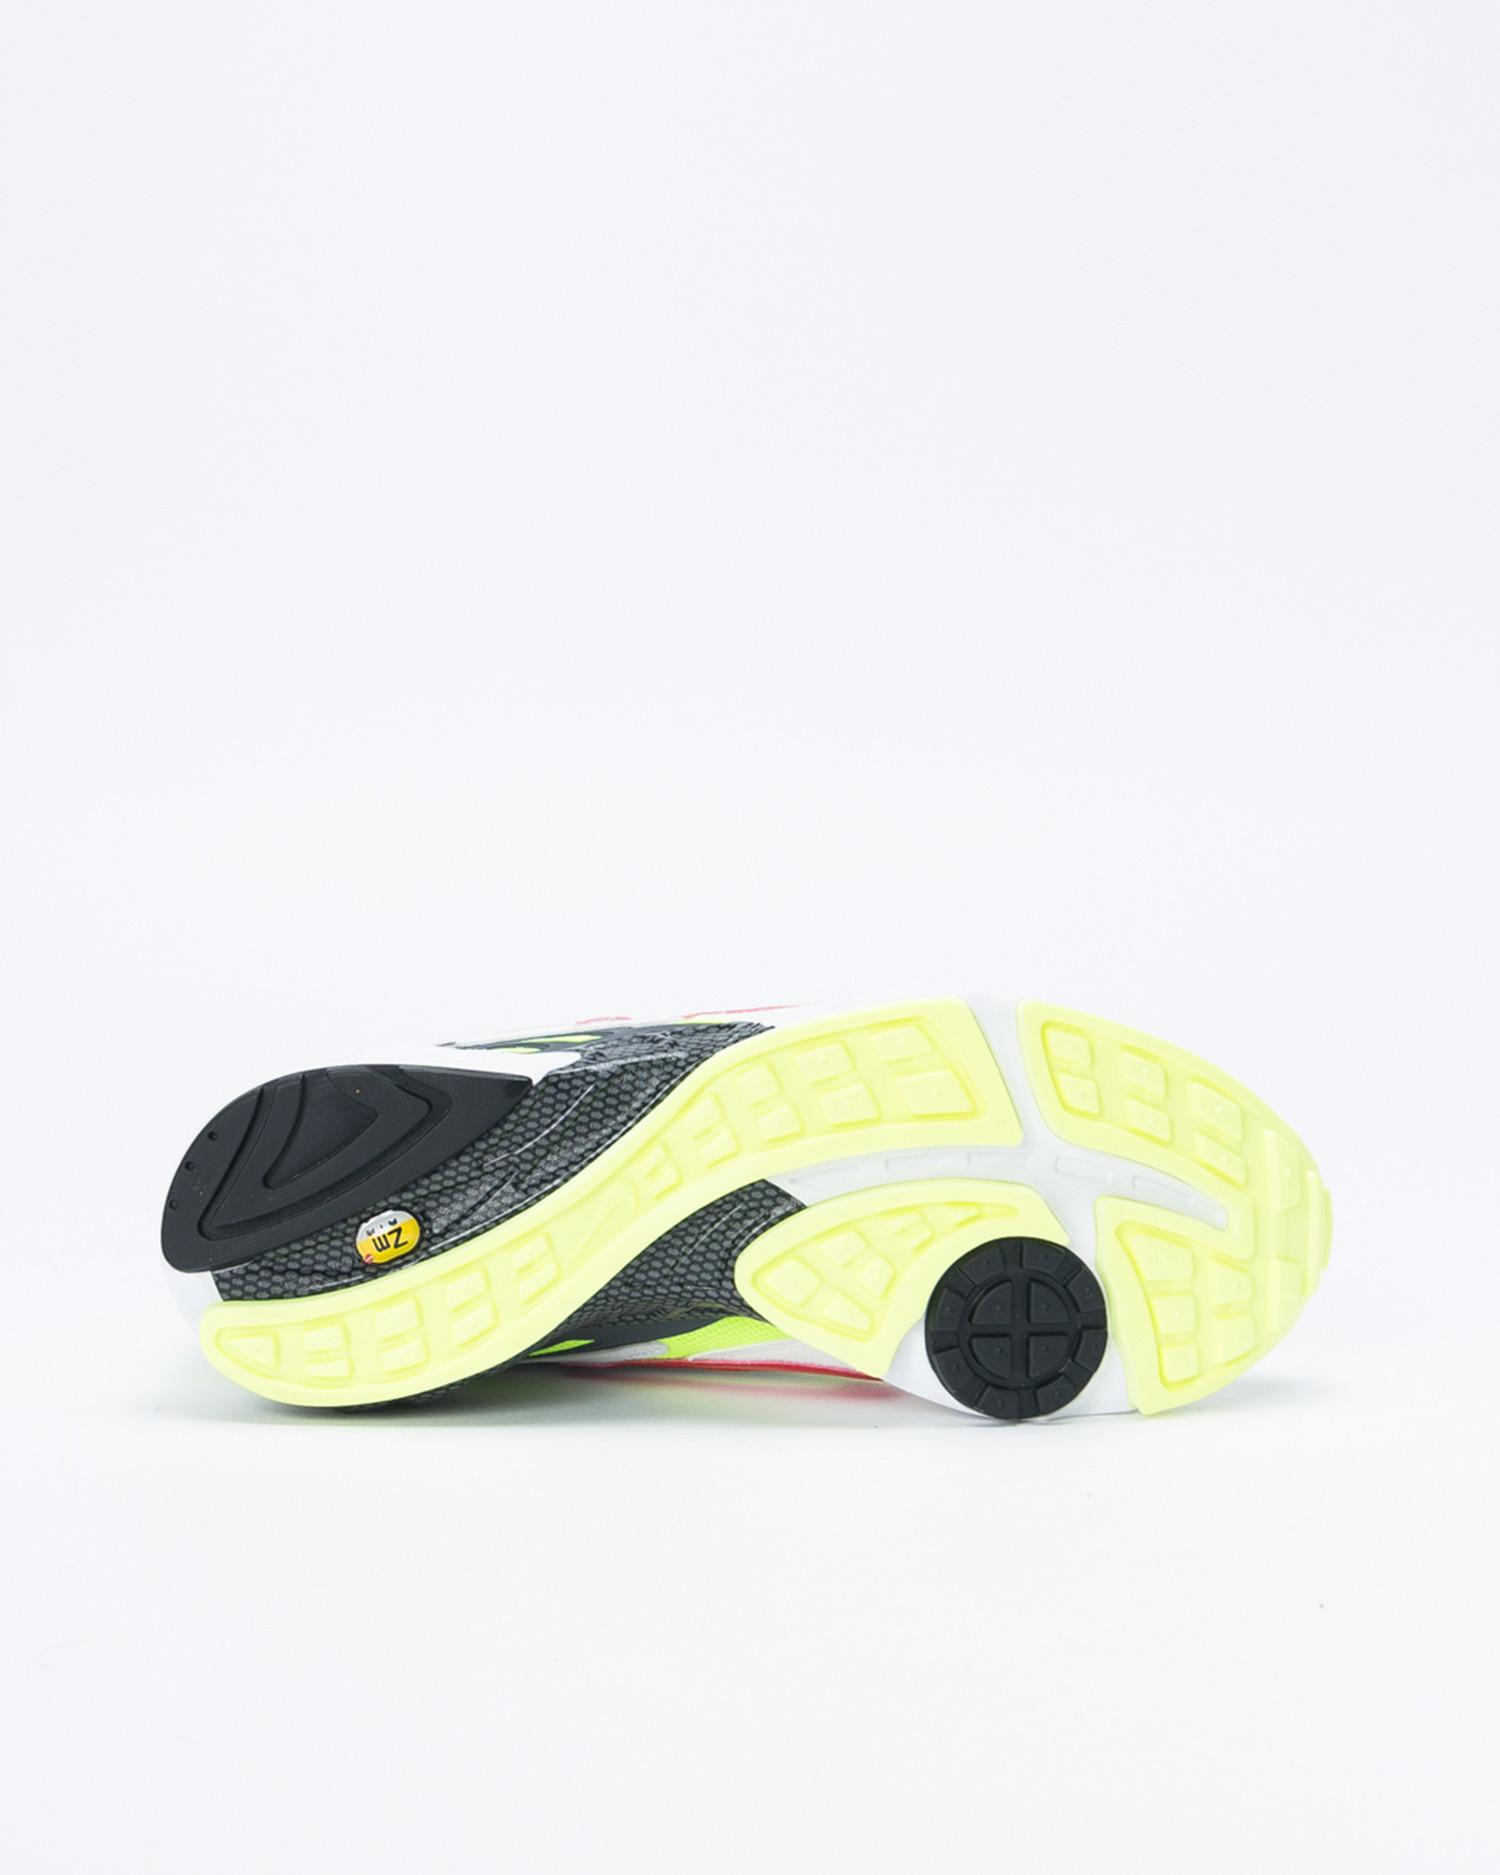 Nike Air Ghost Racer White/Atom Red/Neon yellow/Dark grey